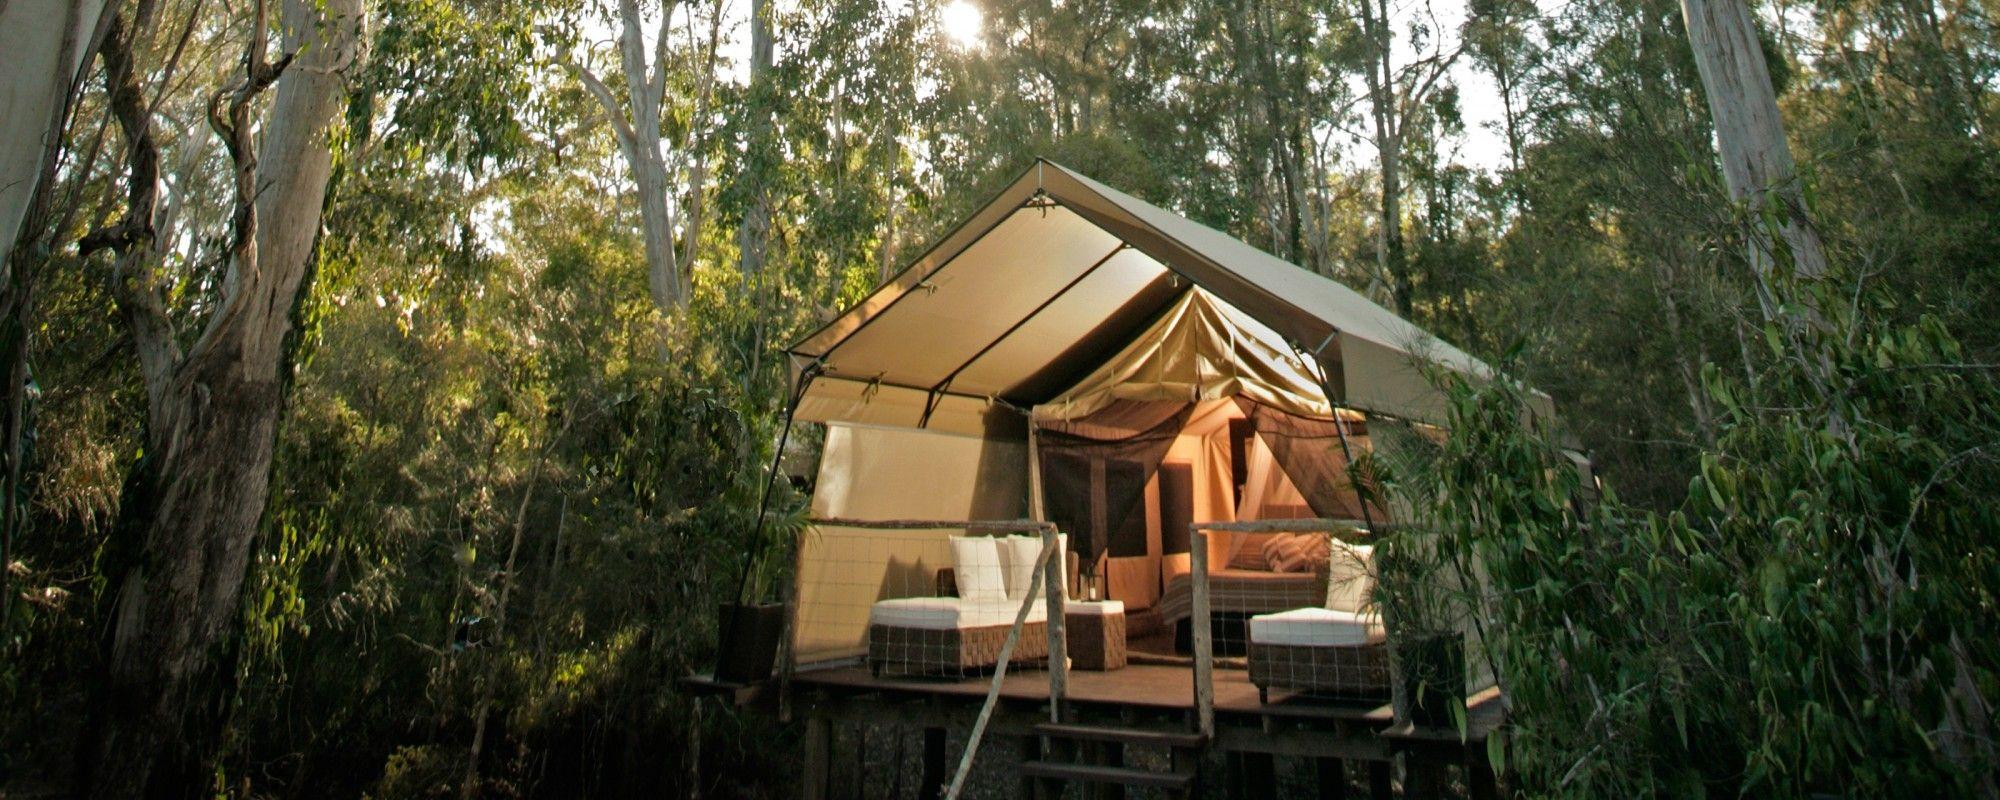 Hotel ecológico na Austrália. Wish list! Glamping, Go